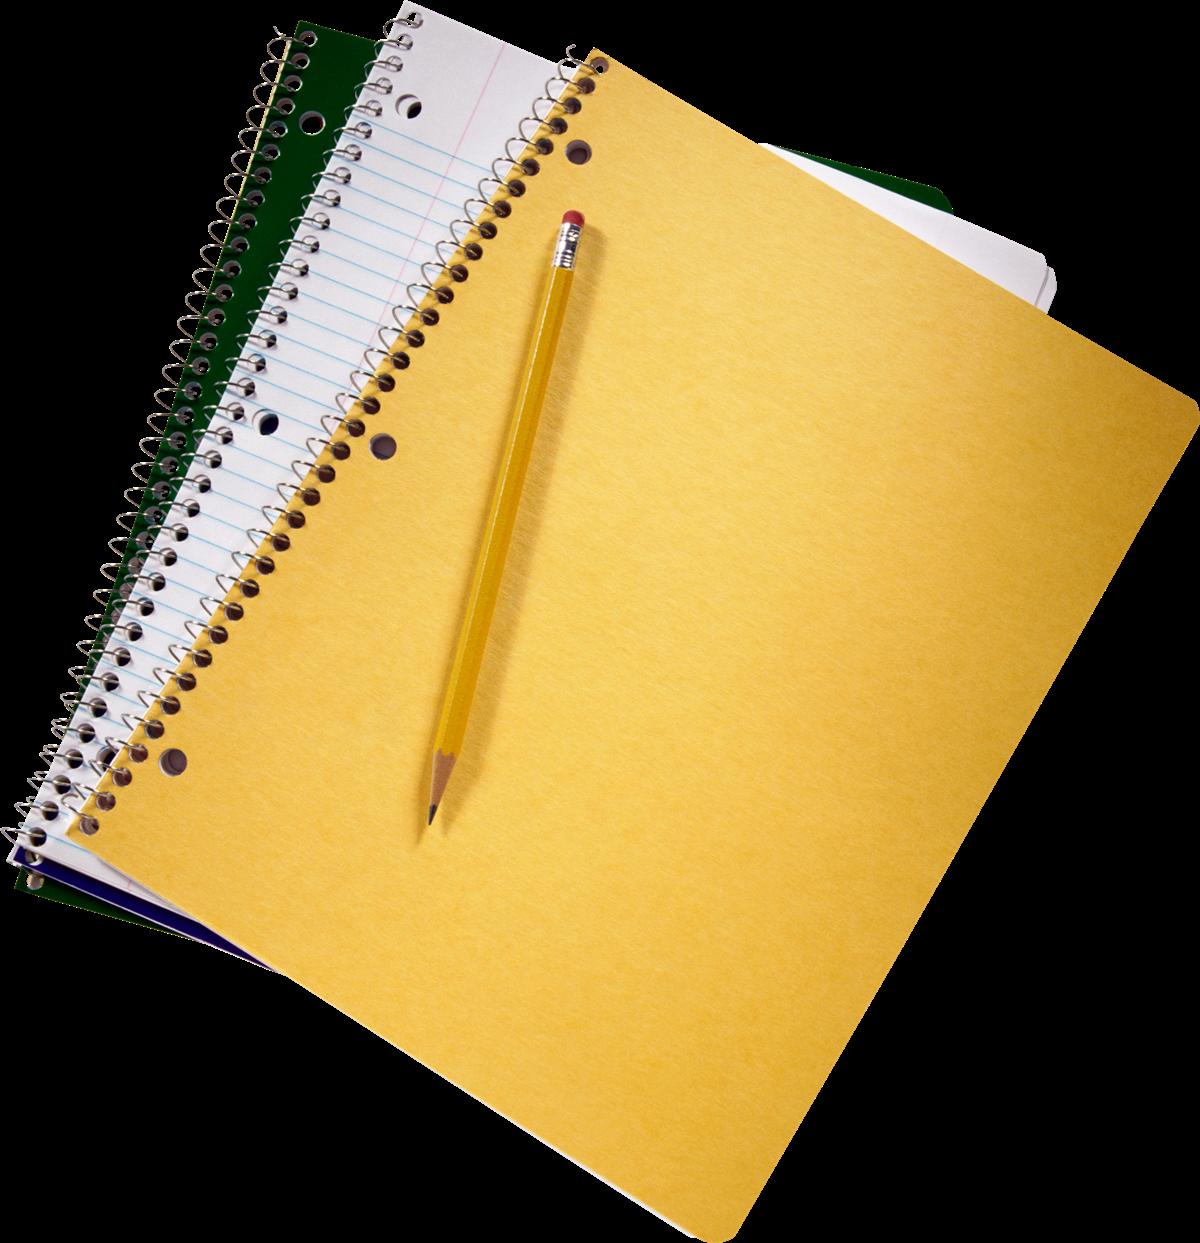 Notebook PNG Transparent File.